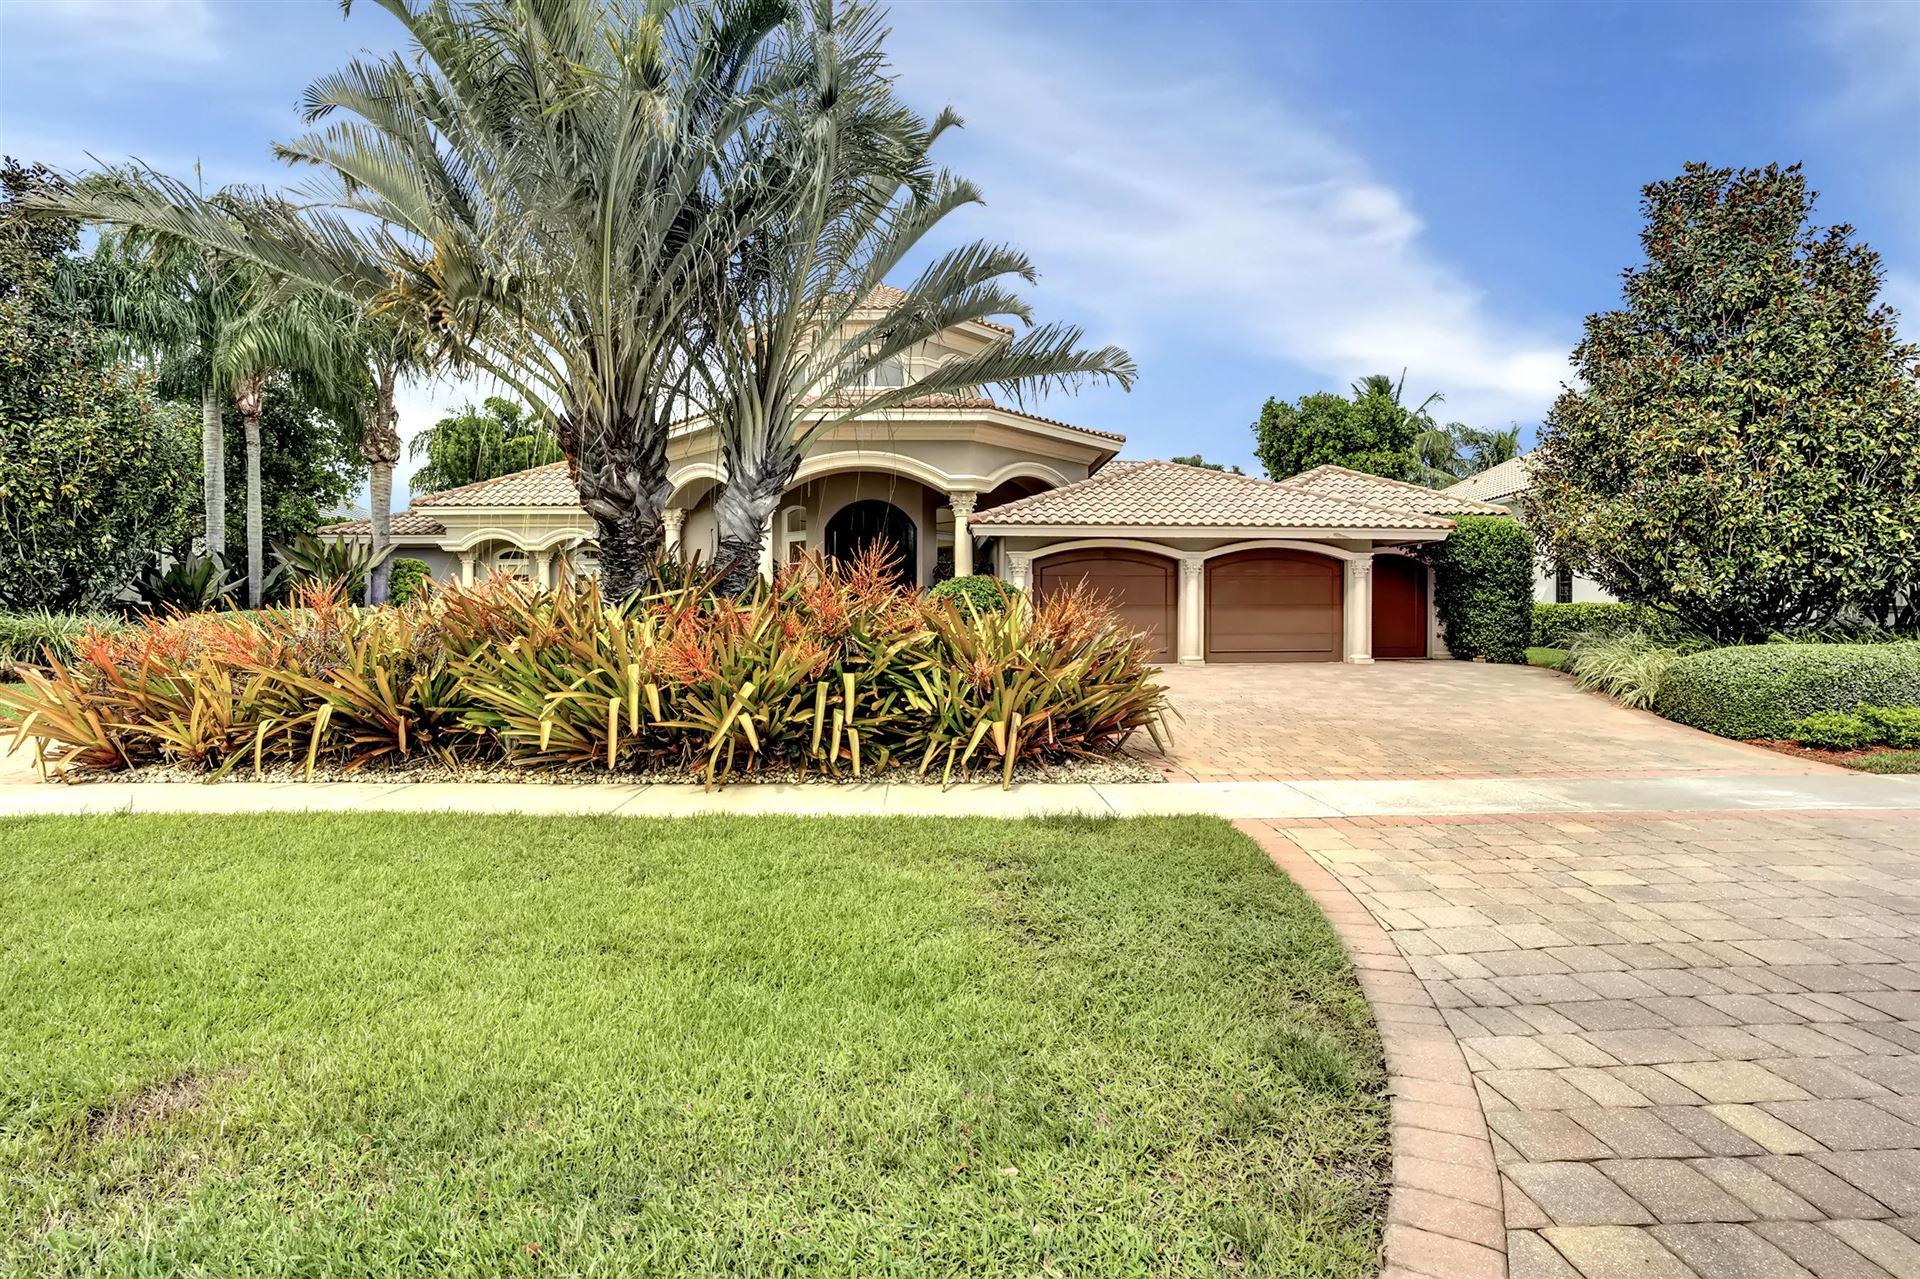 4517 White Cedar Lane, Delray Beach, FL 33445 - MLS#: RX-10664520